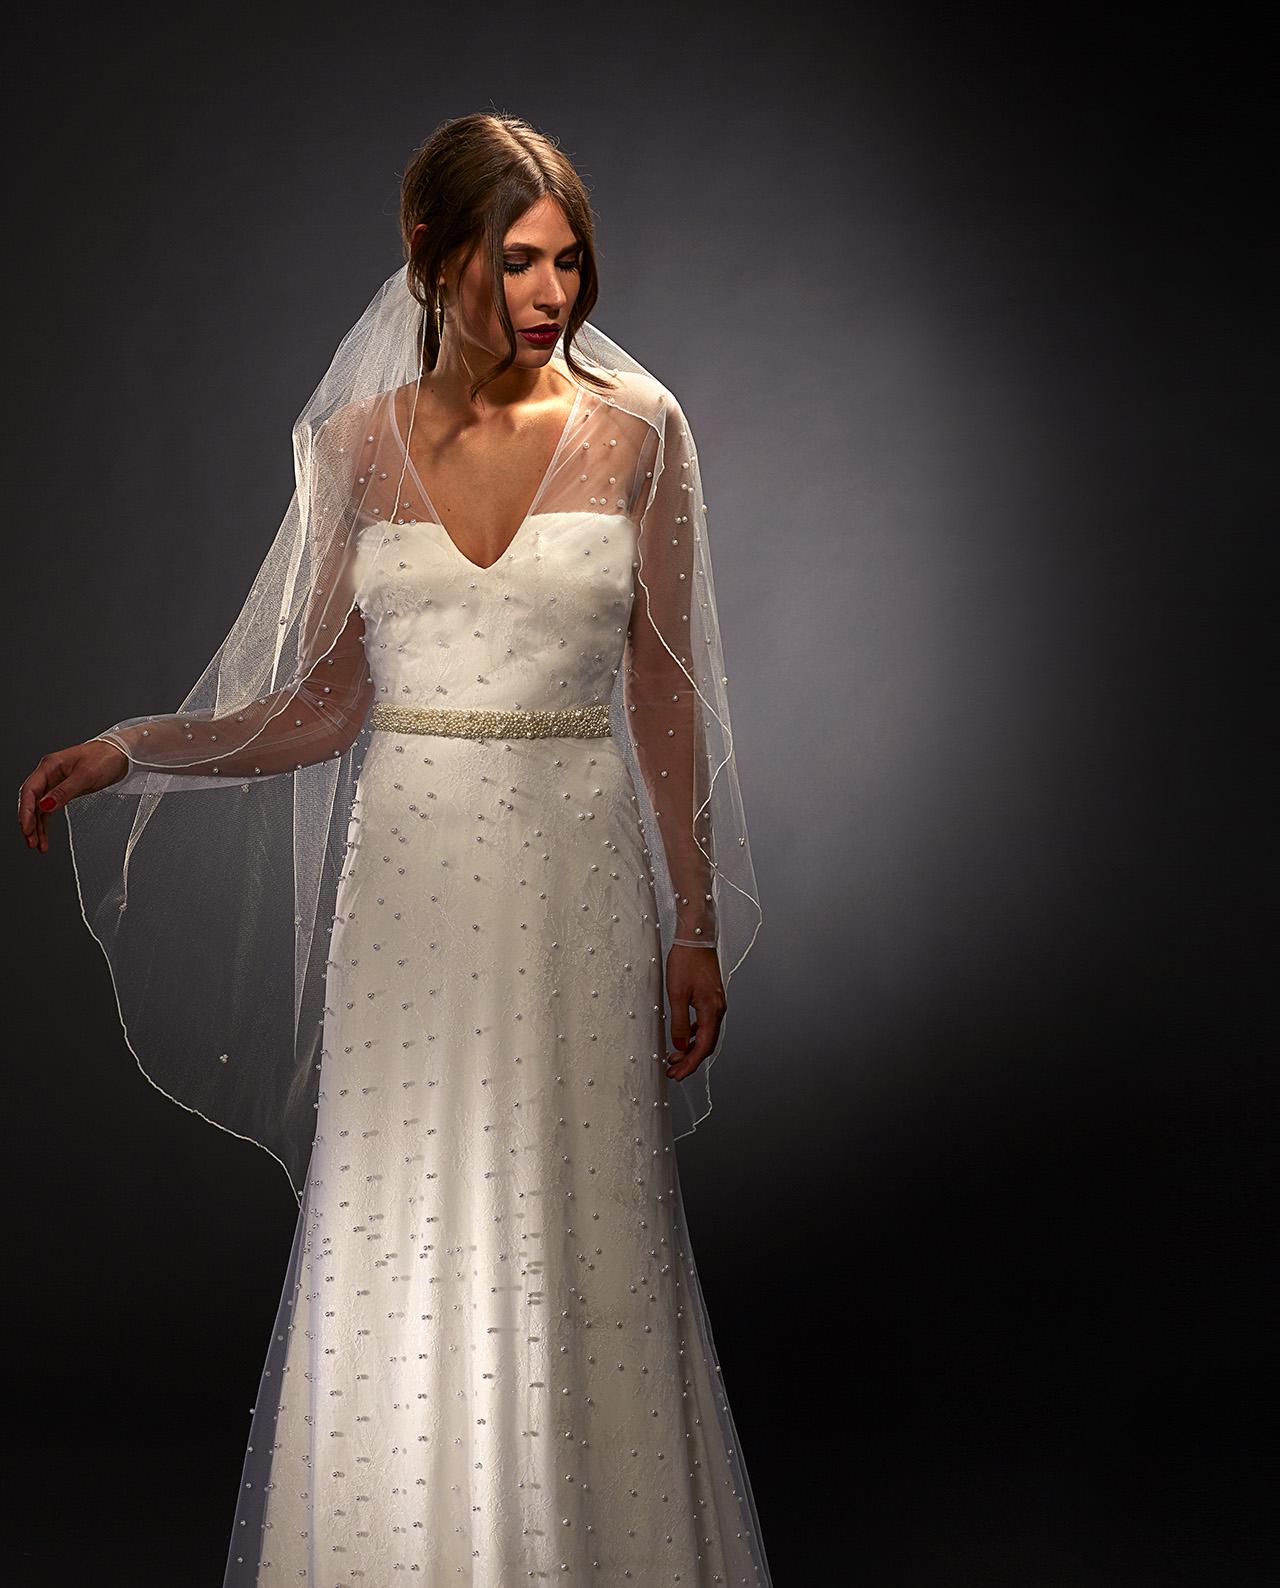 de0507b50b67 Bergman Perle Bælte. Brudebælter. Luxury Bridal Wear. Brudetilbehør.  Gudnitz Copenhagen